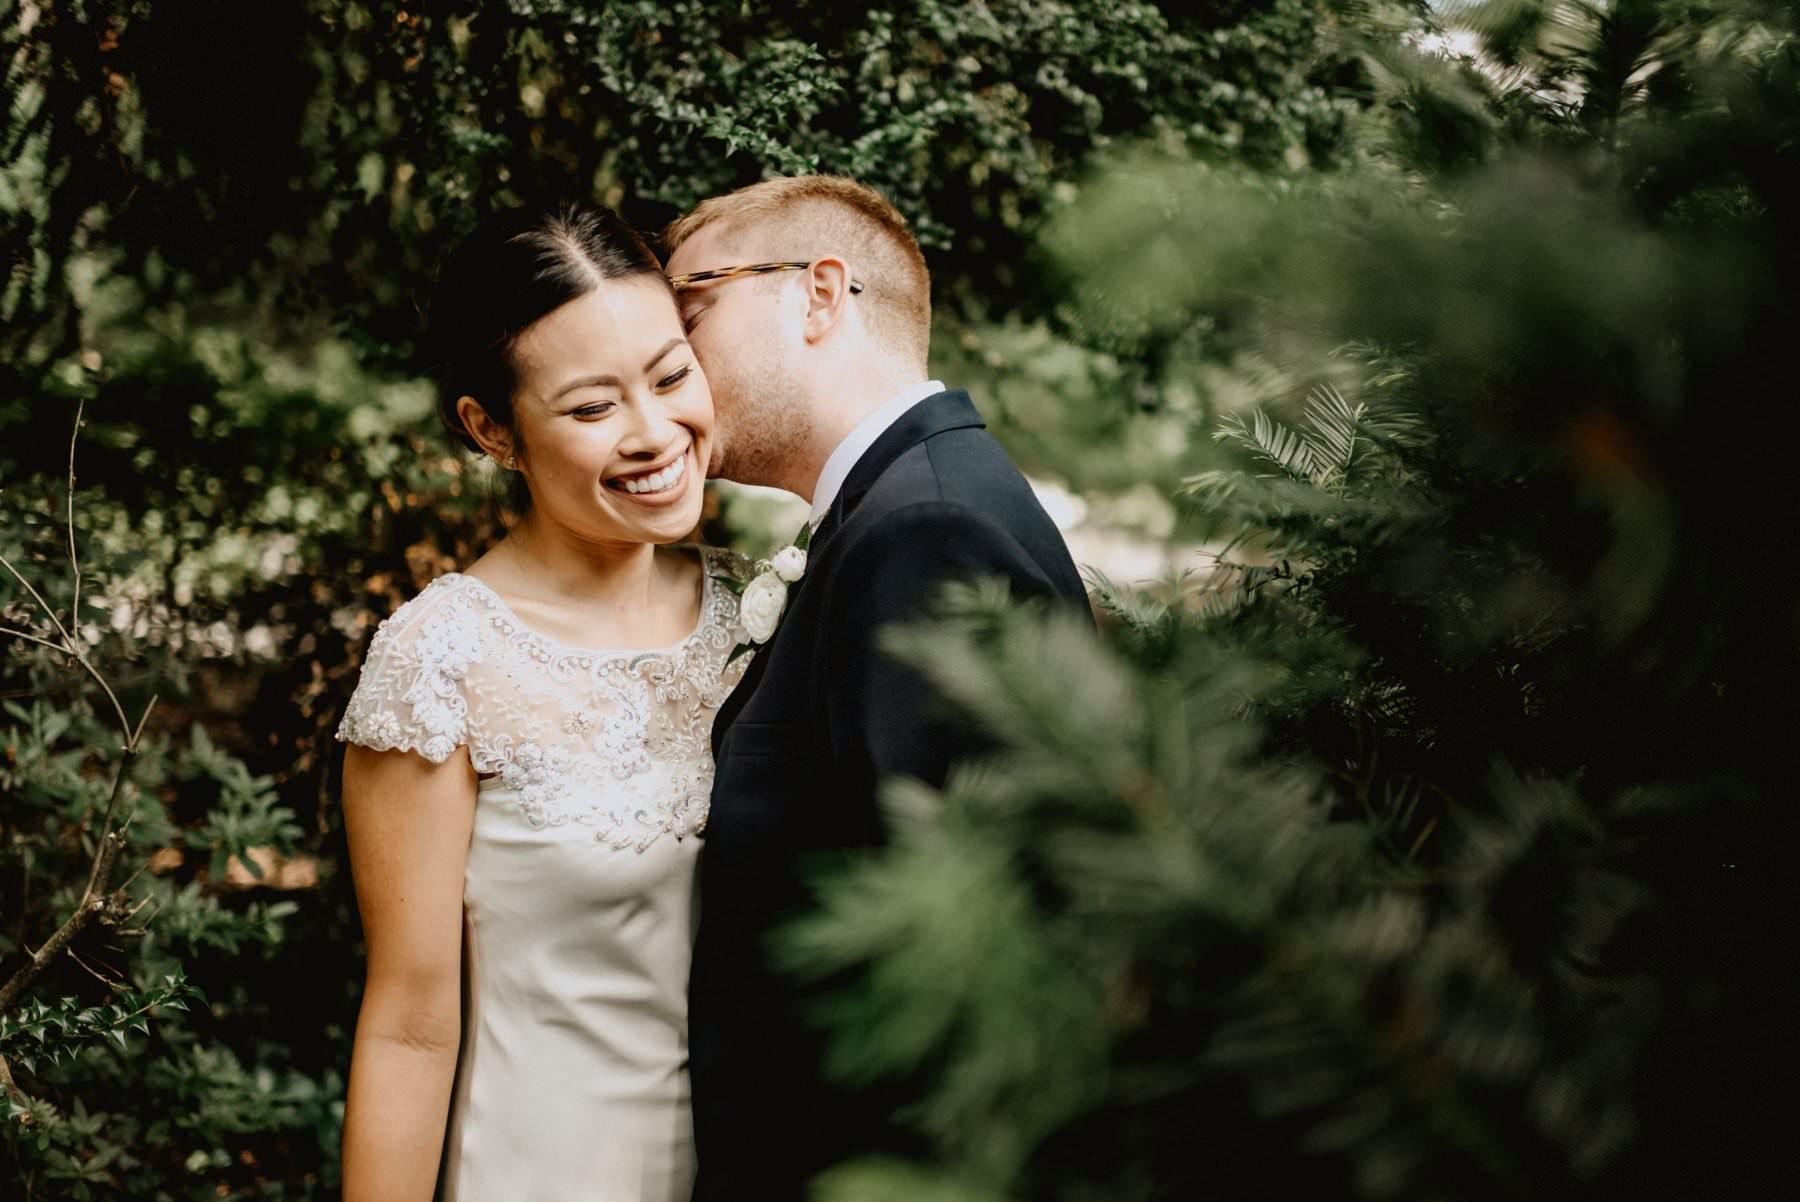 Appleford-estate-wedding-47.jpg